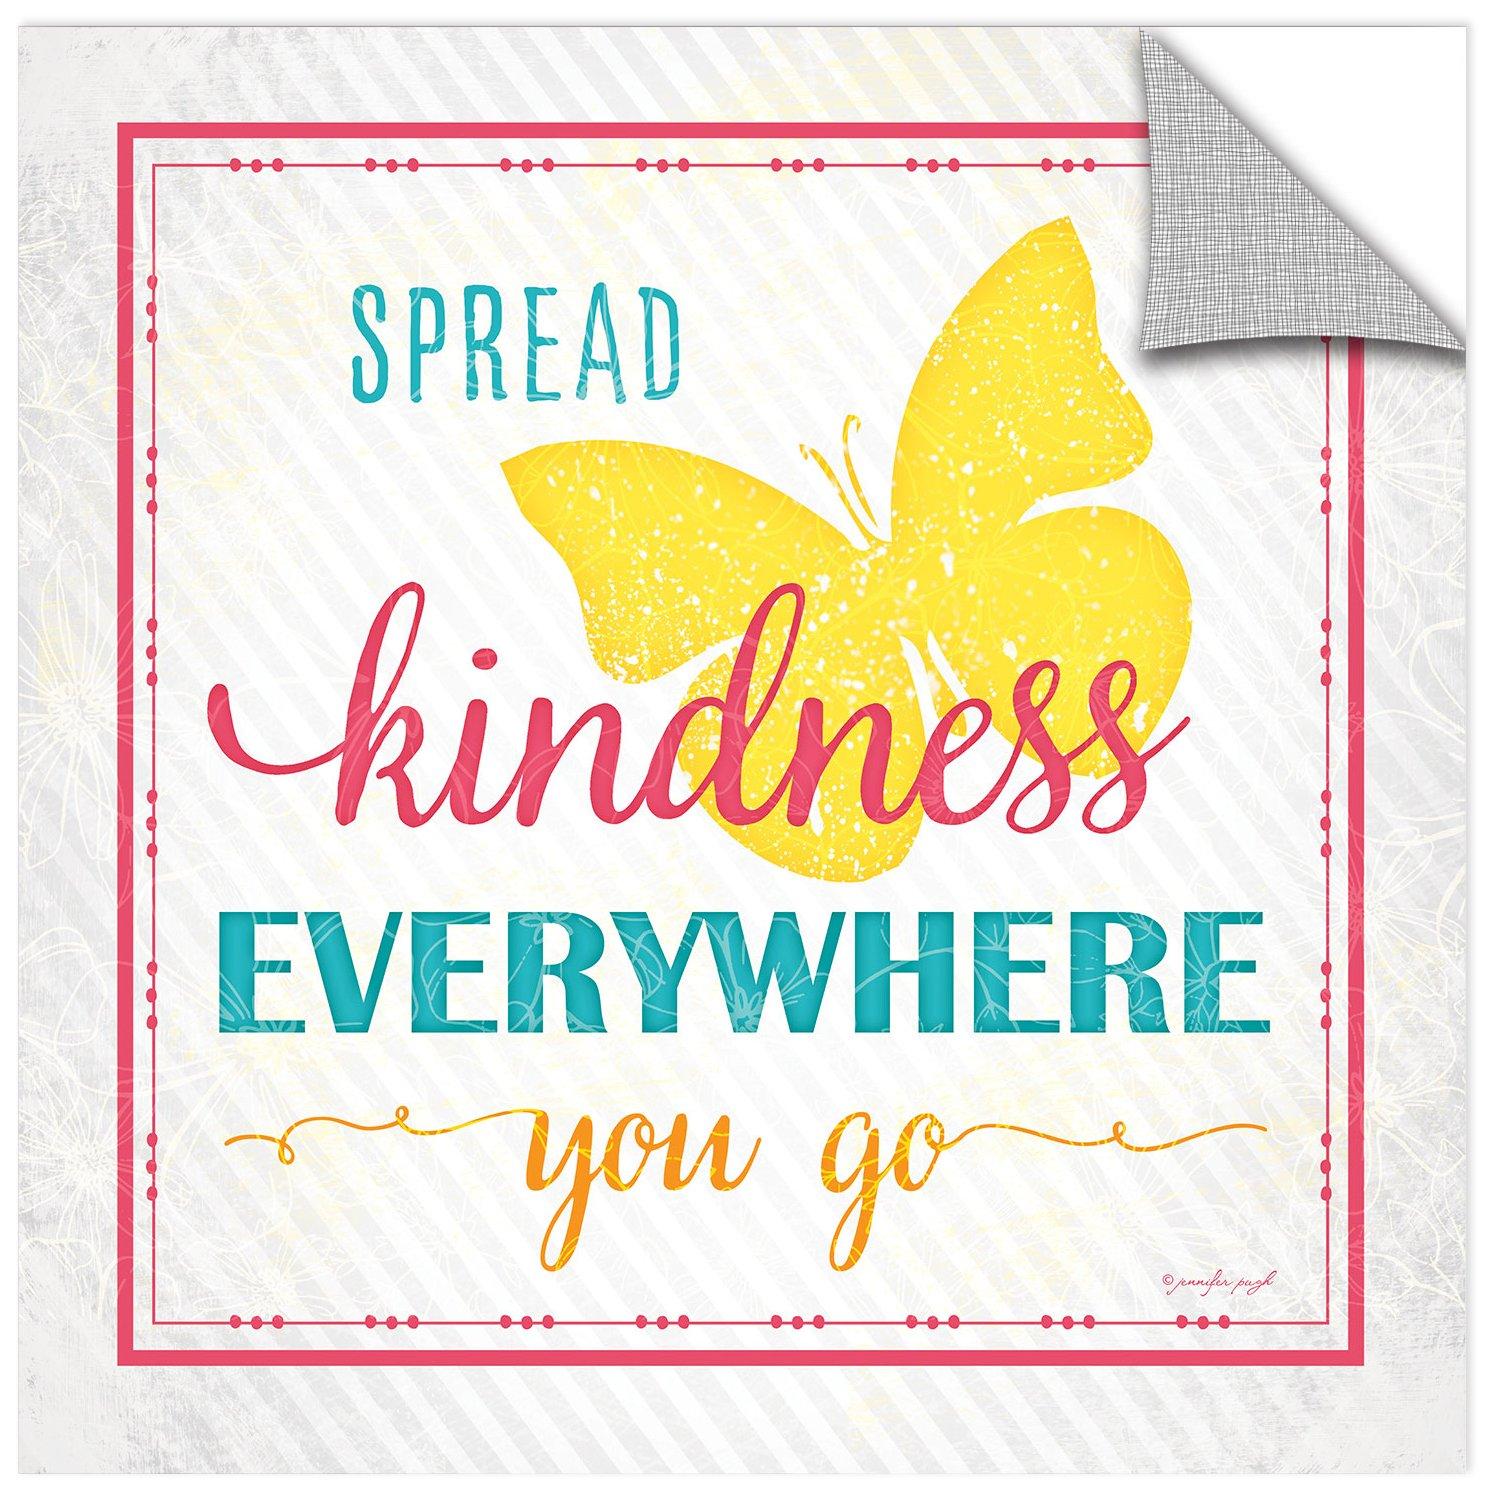 Removable Wall Art Mural 24X24 ArtWall Jennifer Pughs Spread Kindness